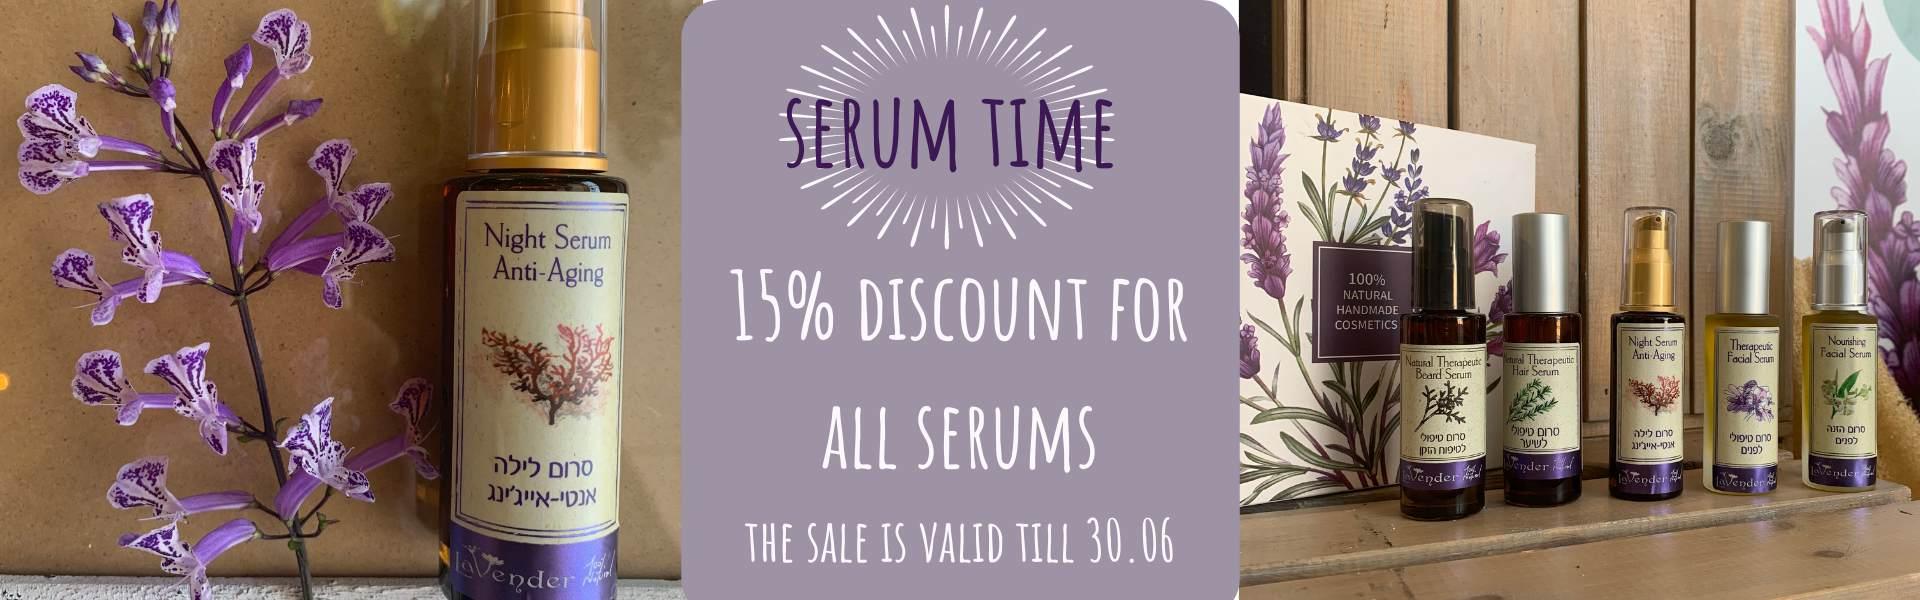 serum sale 2021- lavender all natural cosmetics